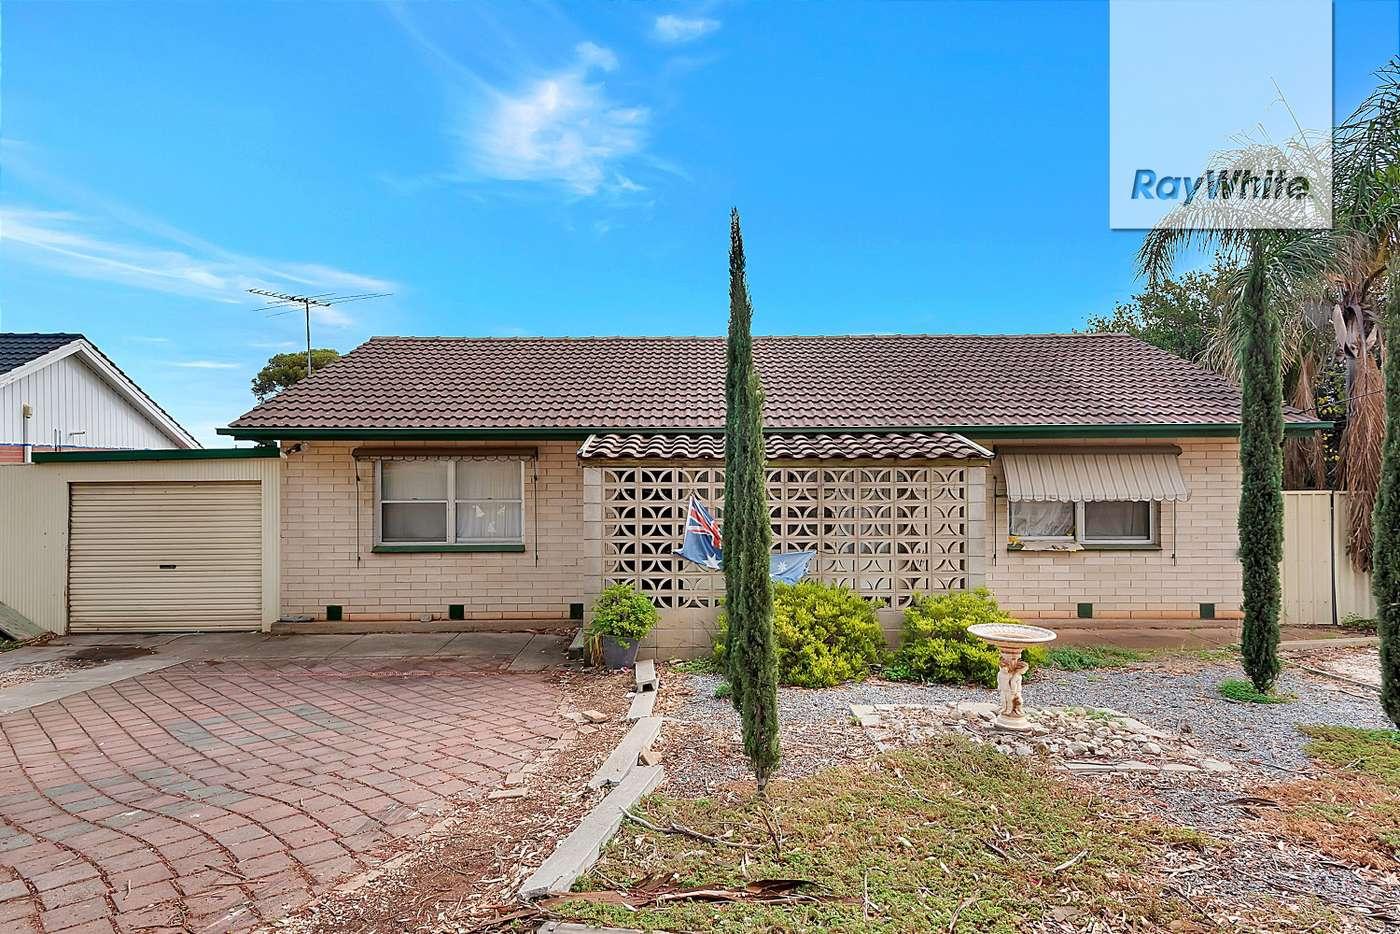 Main view of Homely house listing, 20 Mettika Avenue, Ingle Farm SA 5098